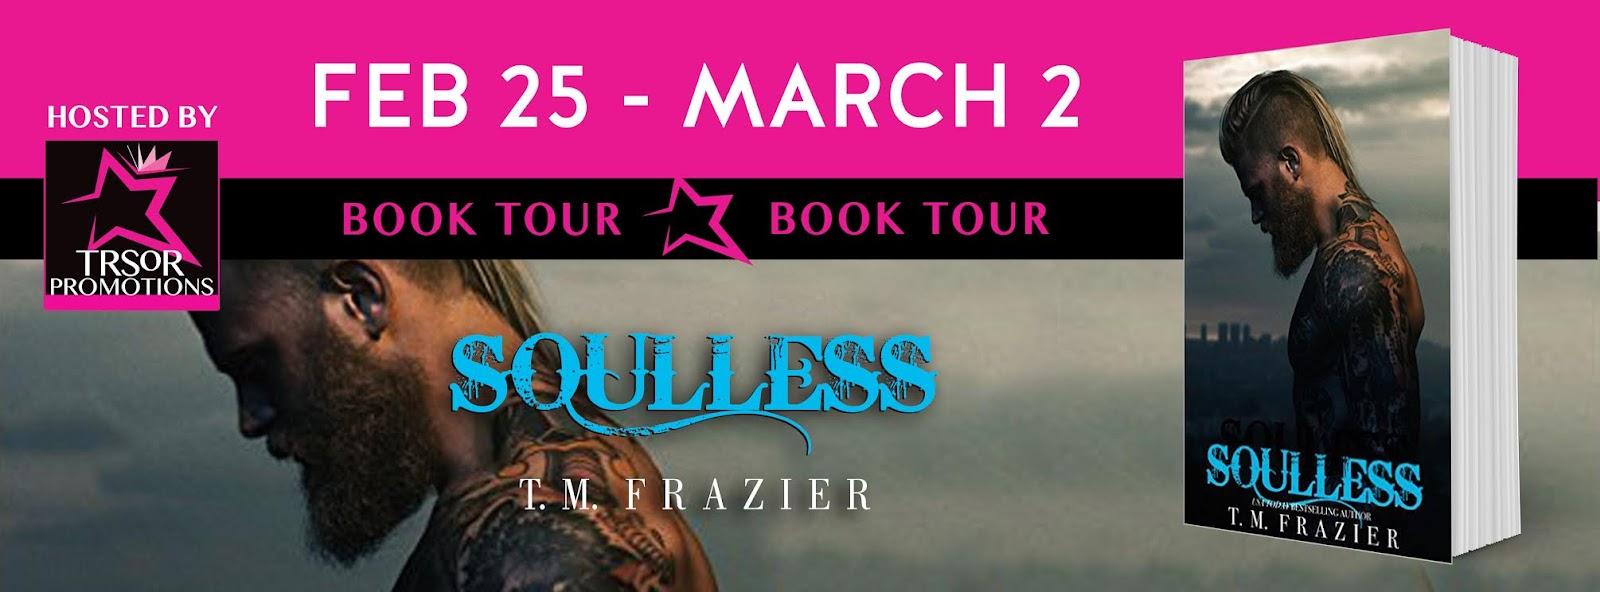 soulless book tour.jpg